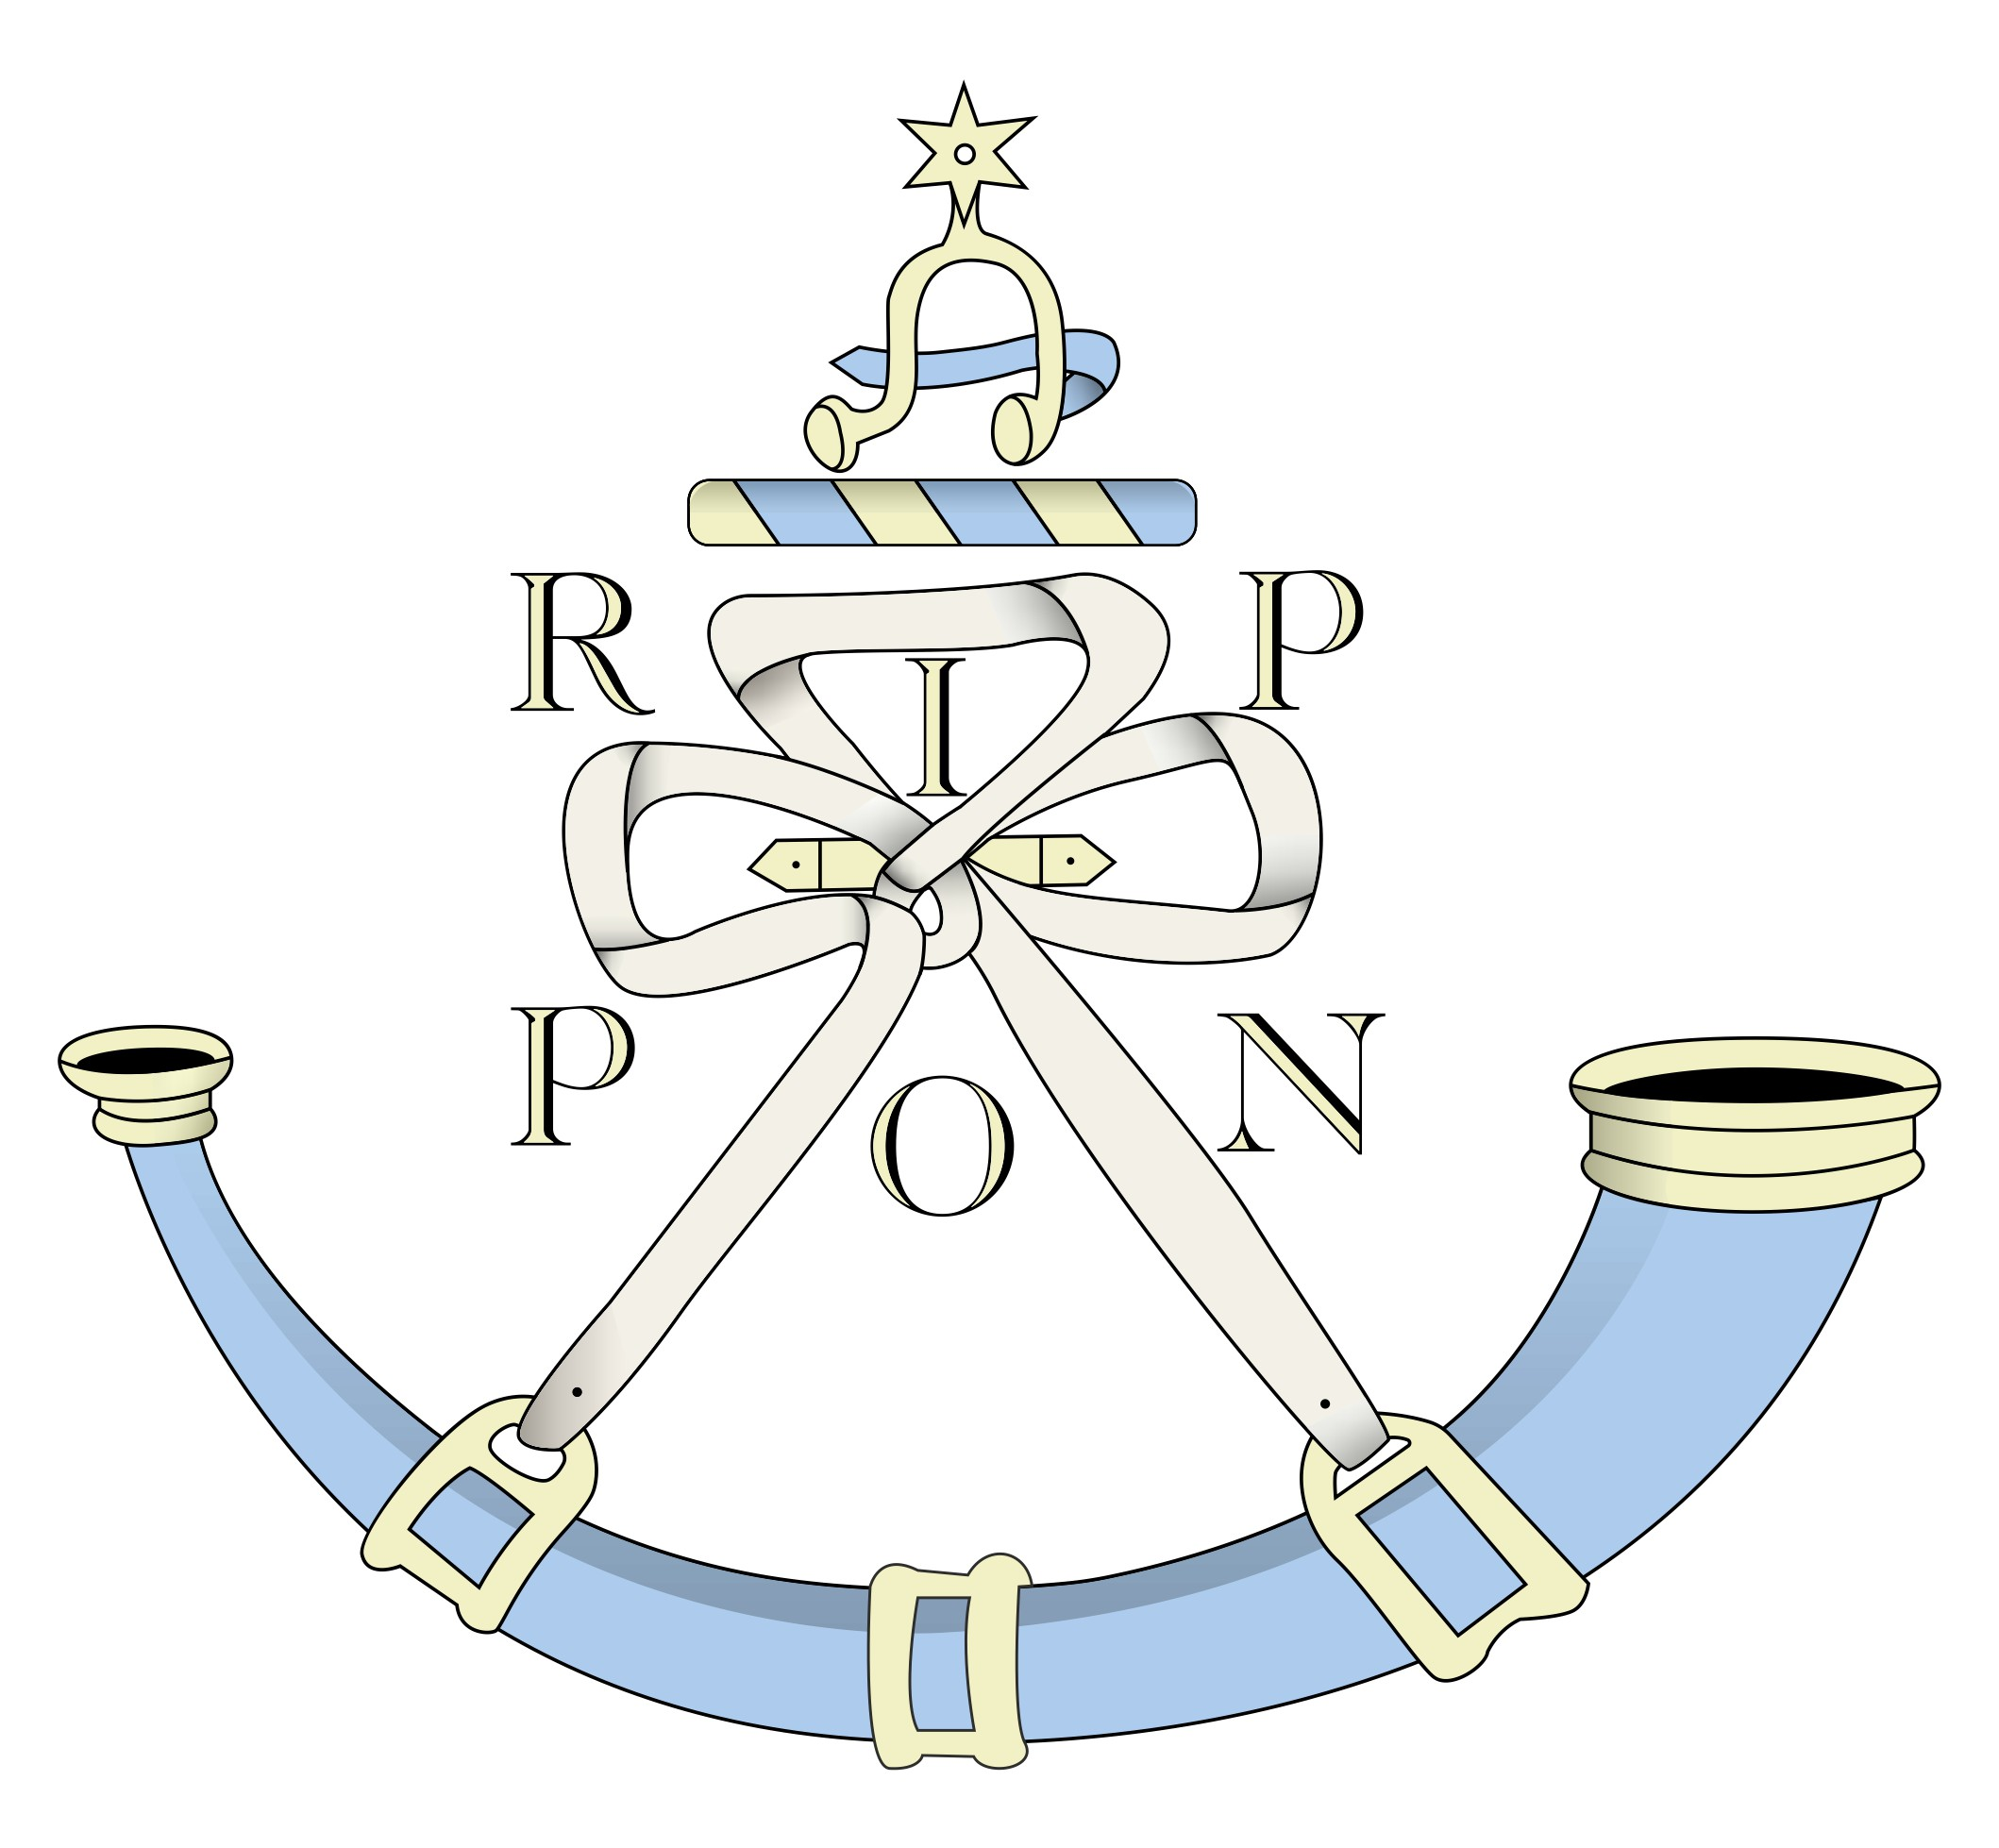 Ripon City Council